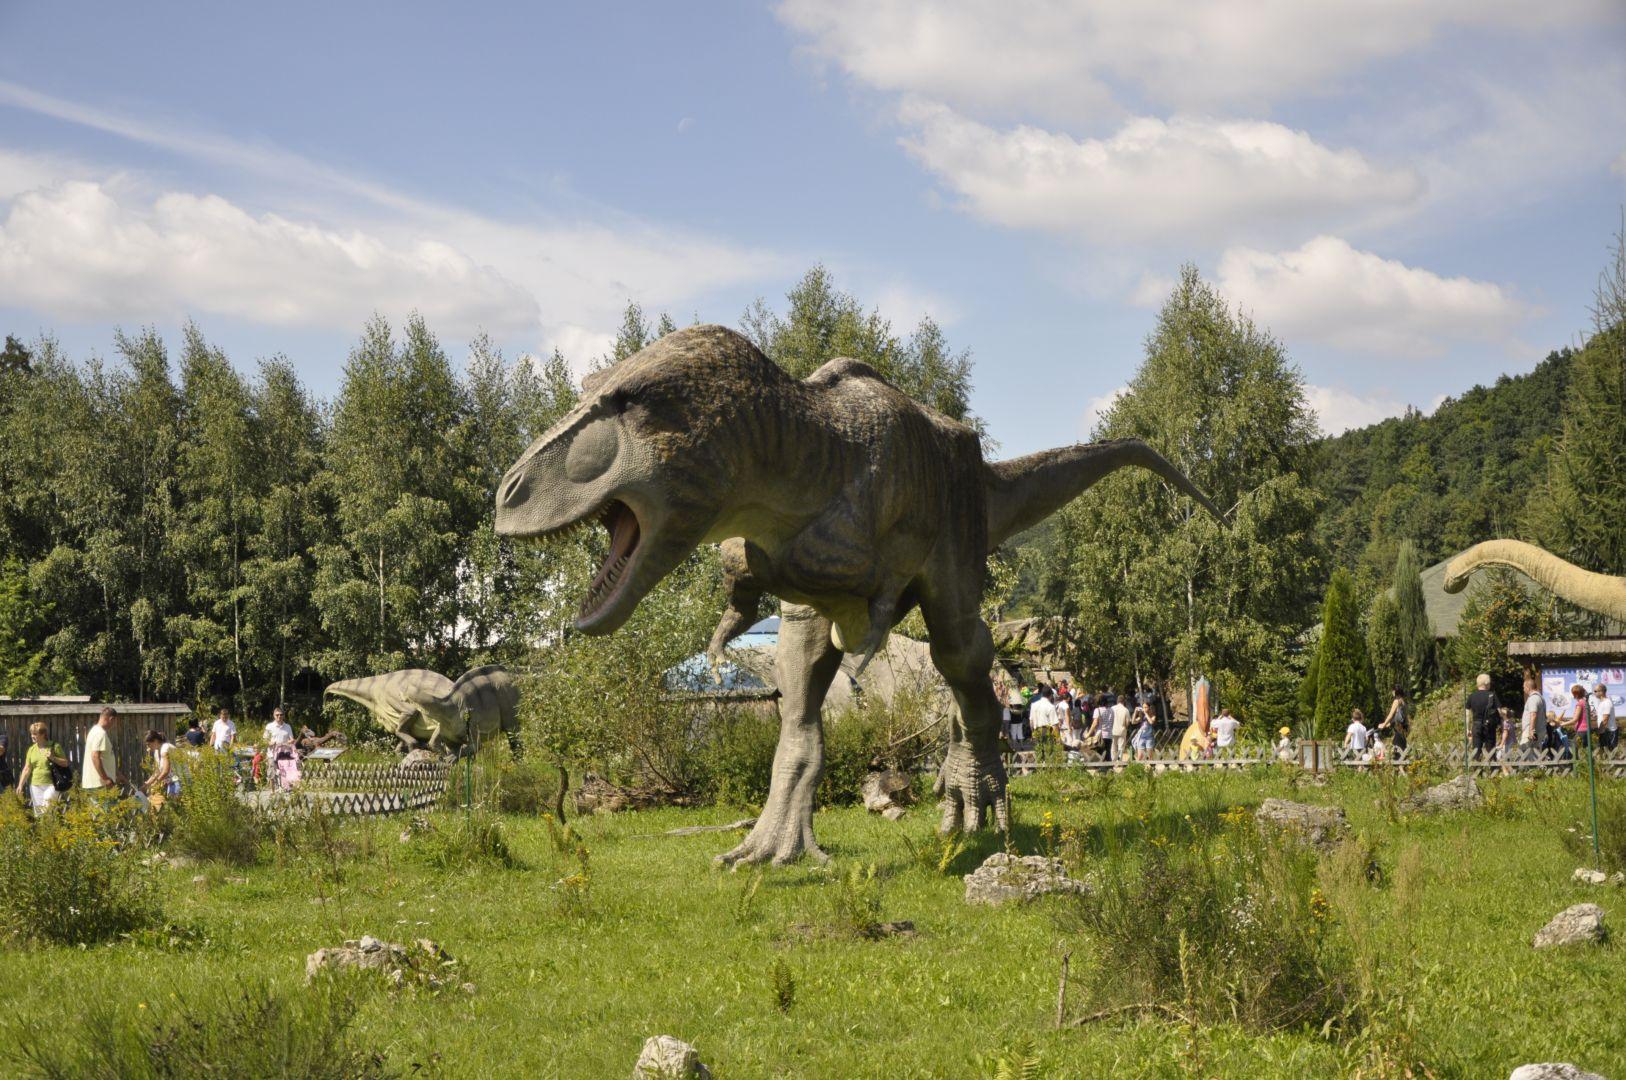 Ścieżka dydaktyczna - model Tyranozaura